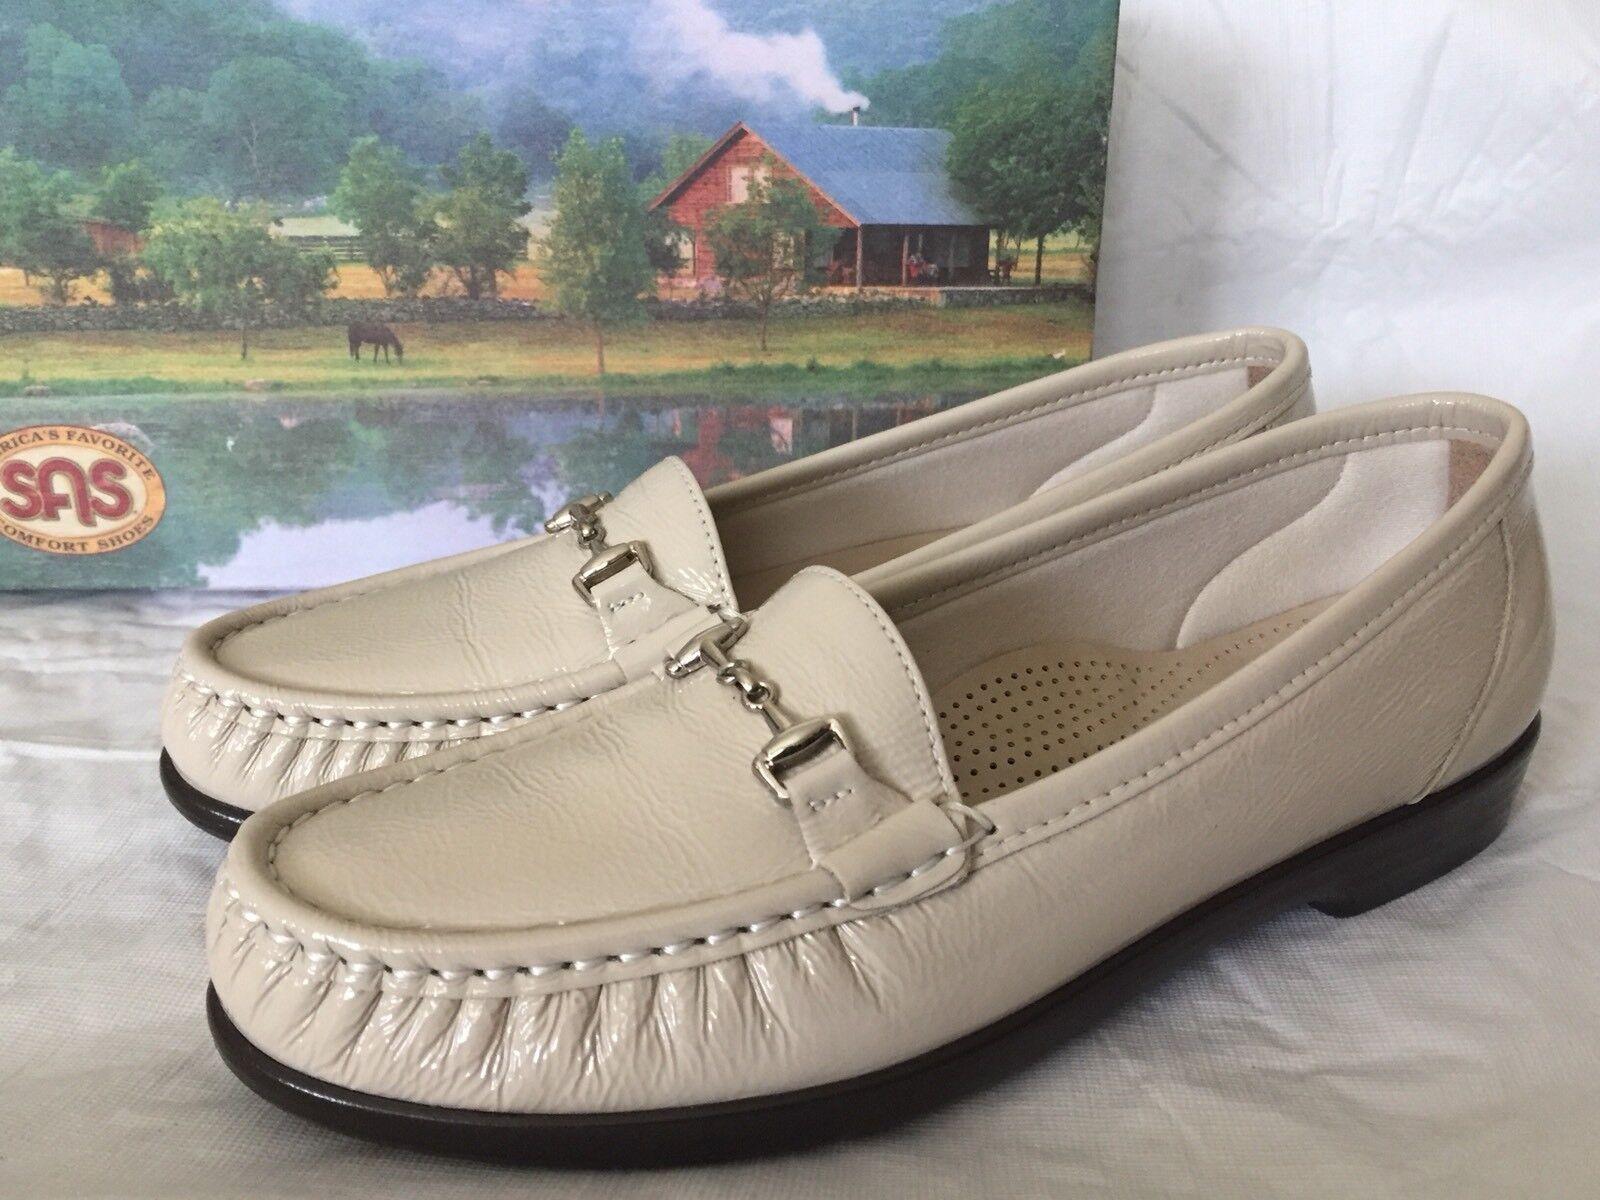 SAS Metro Size Size Size 7.5N Slip On Loafer Bone TriPad Comfort Slip On shoes 575c8f